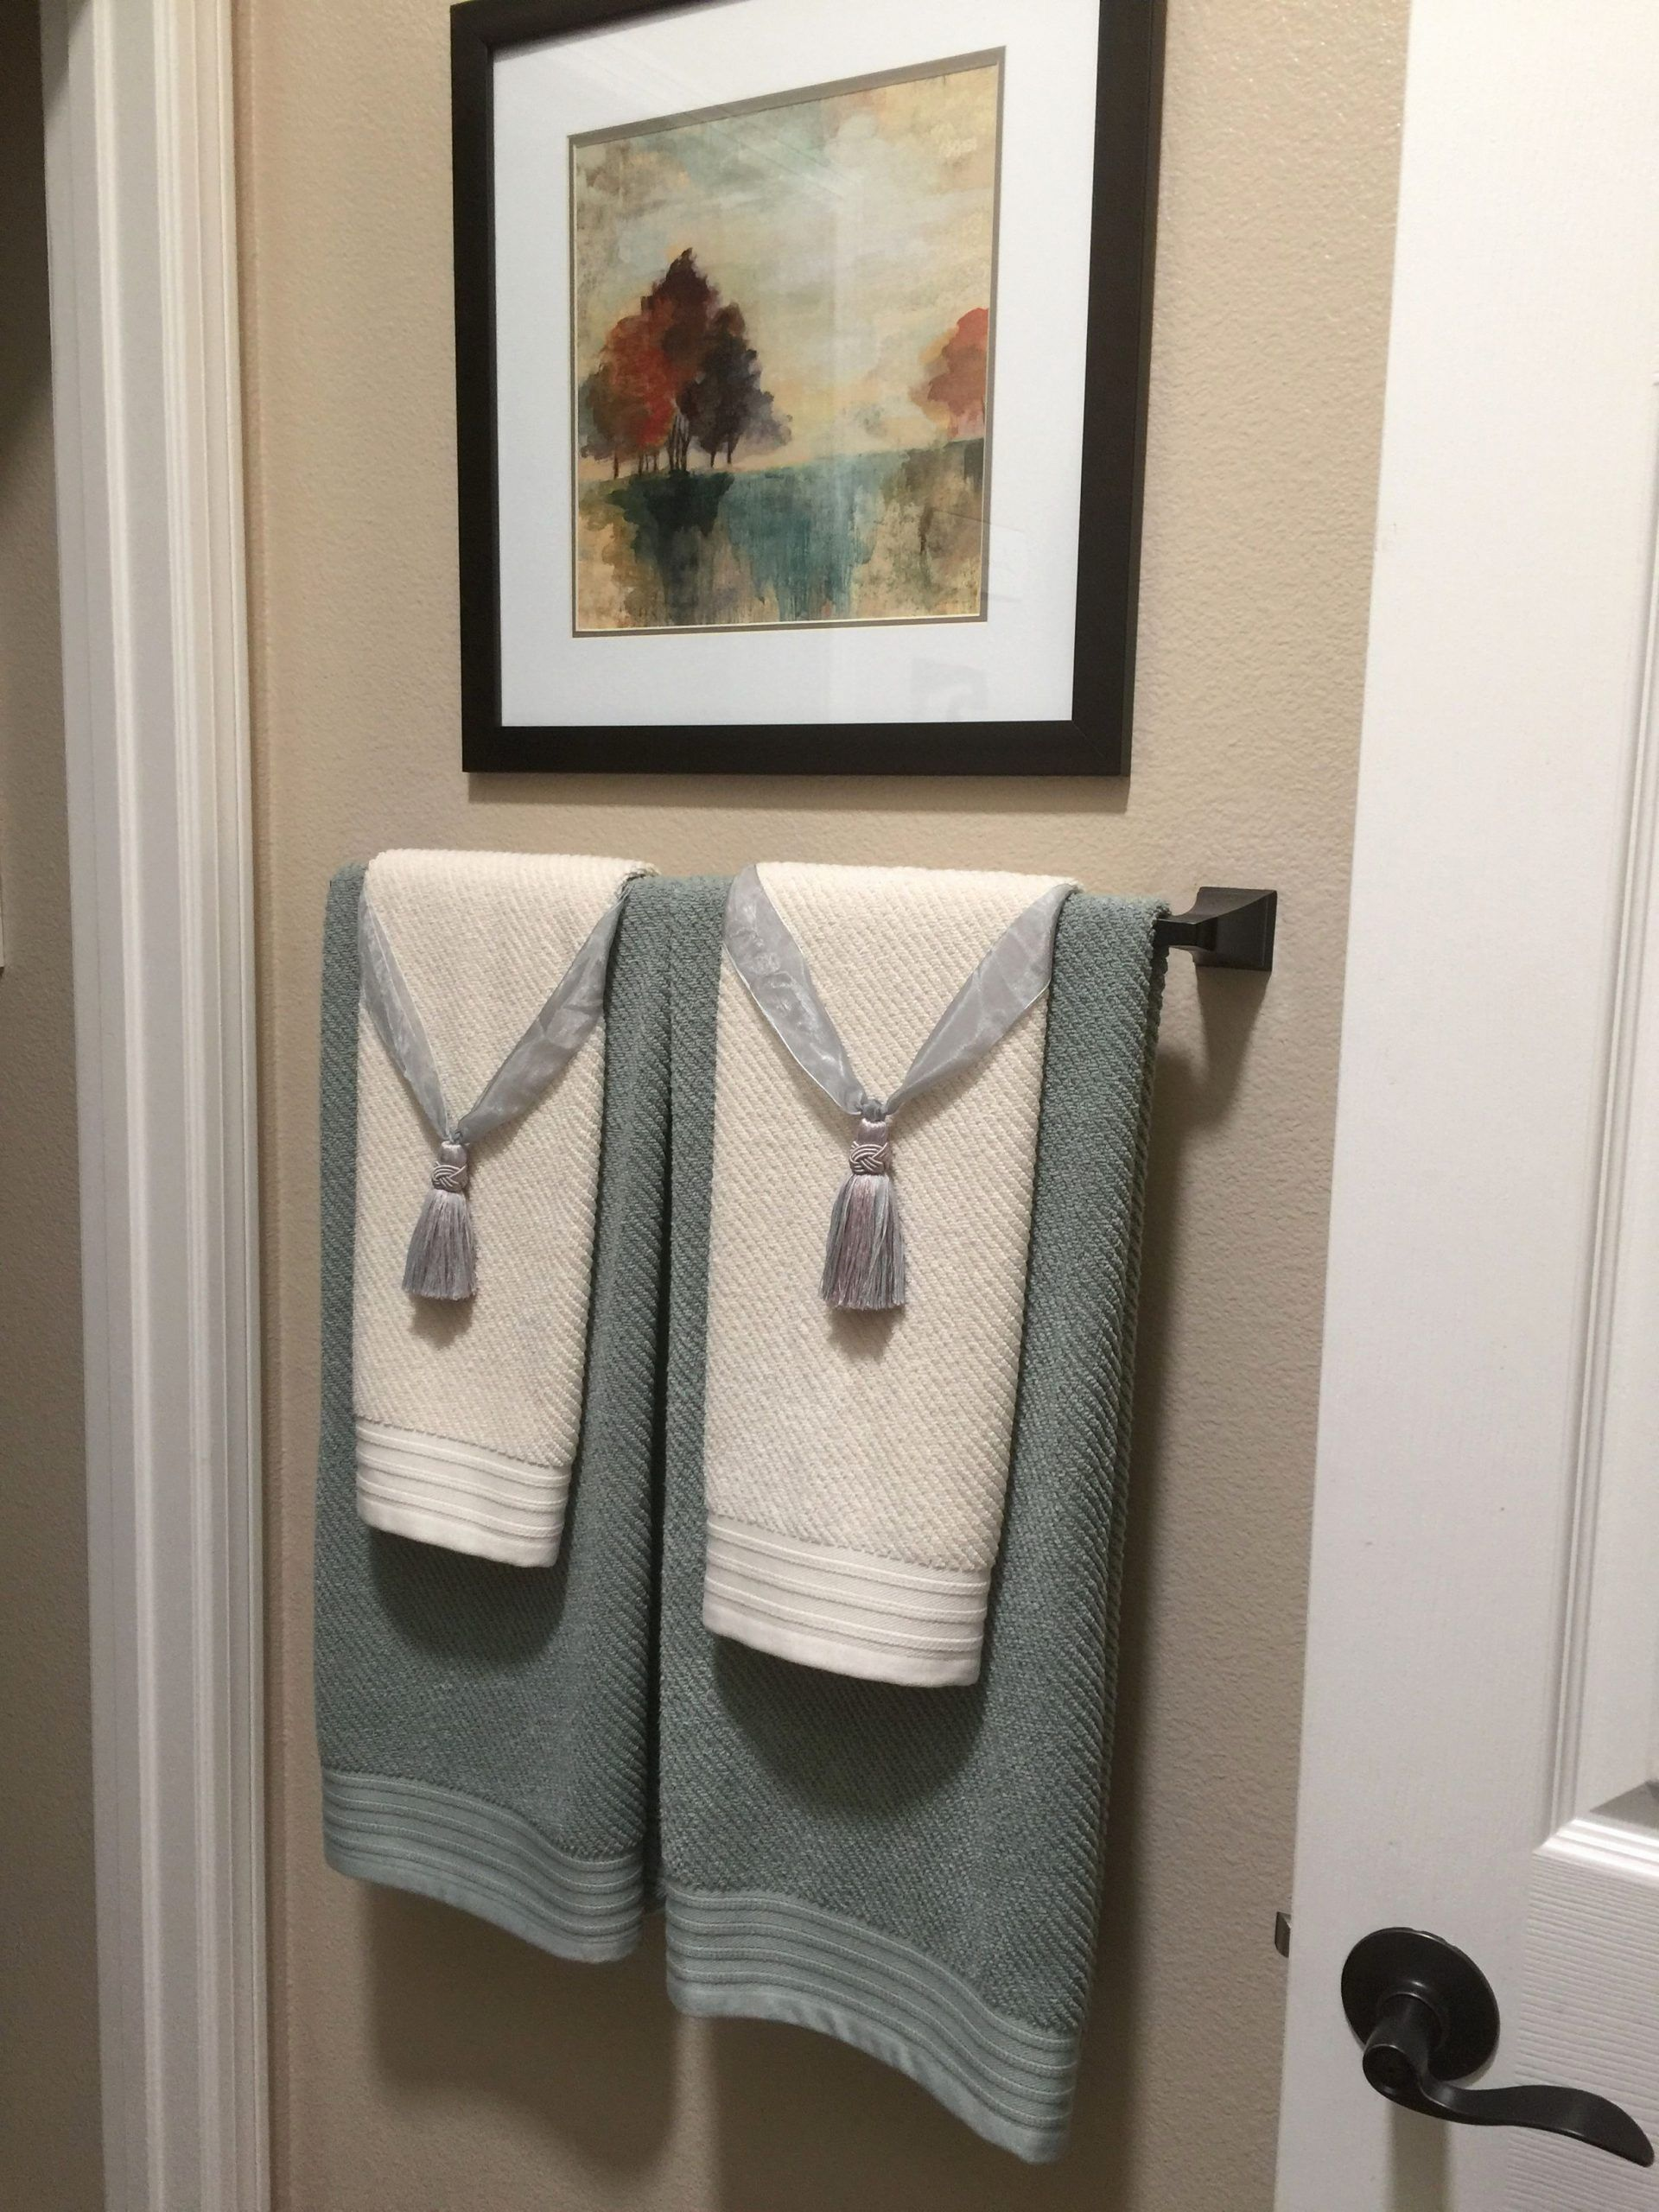 Bathroom Towel Decorating Ideas Inspirational Exclusive Diy Bathroom Towel Decoration Ideas Live Enhance Bathroom Towel Decor Bathroom Towels Decorative Towels